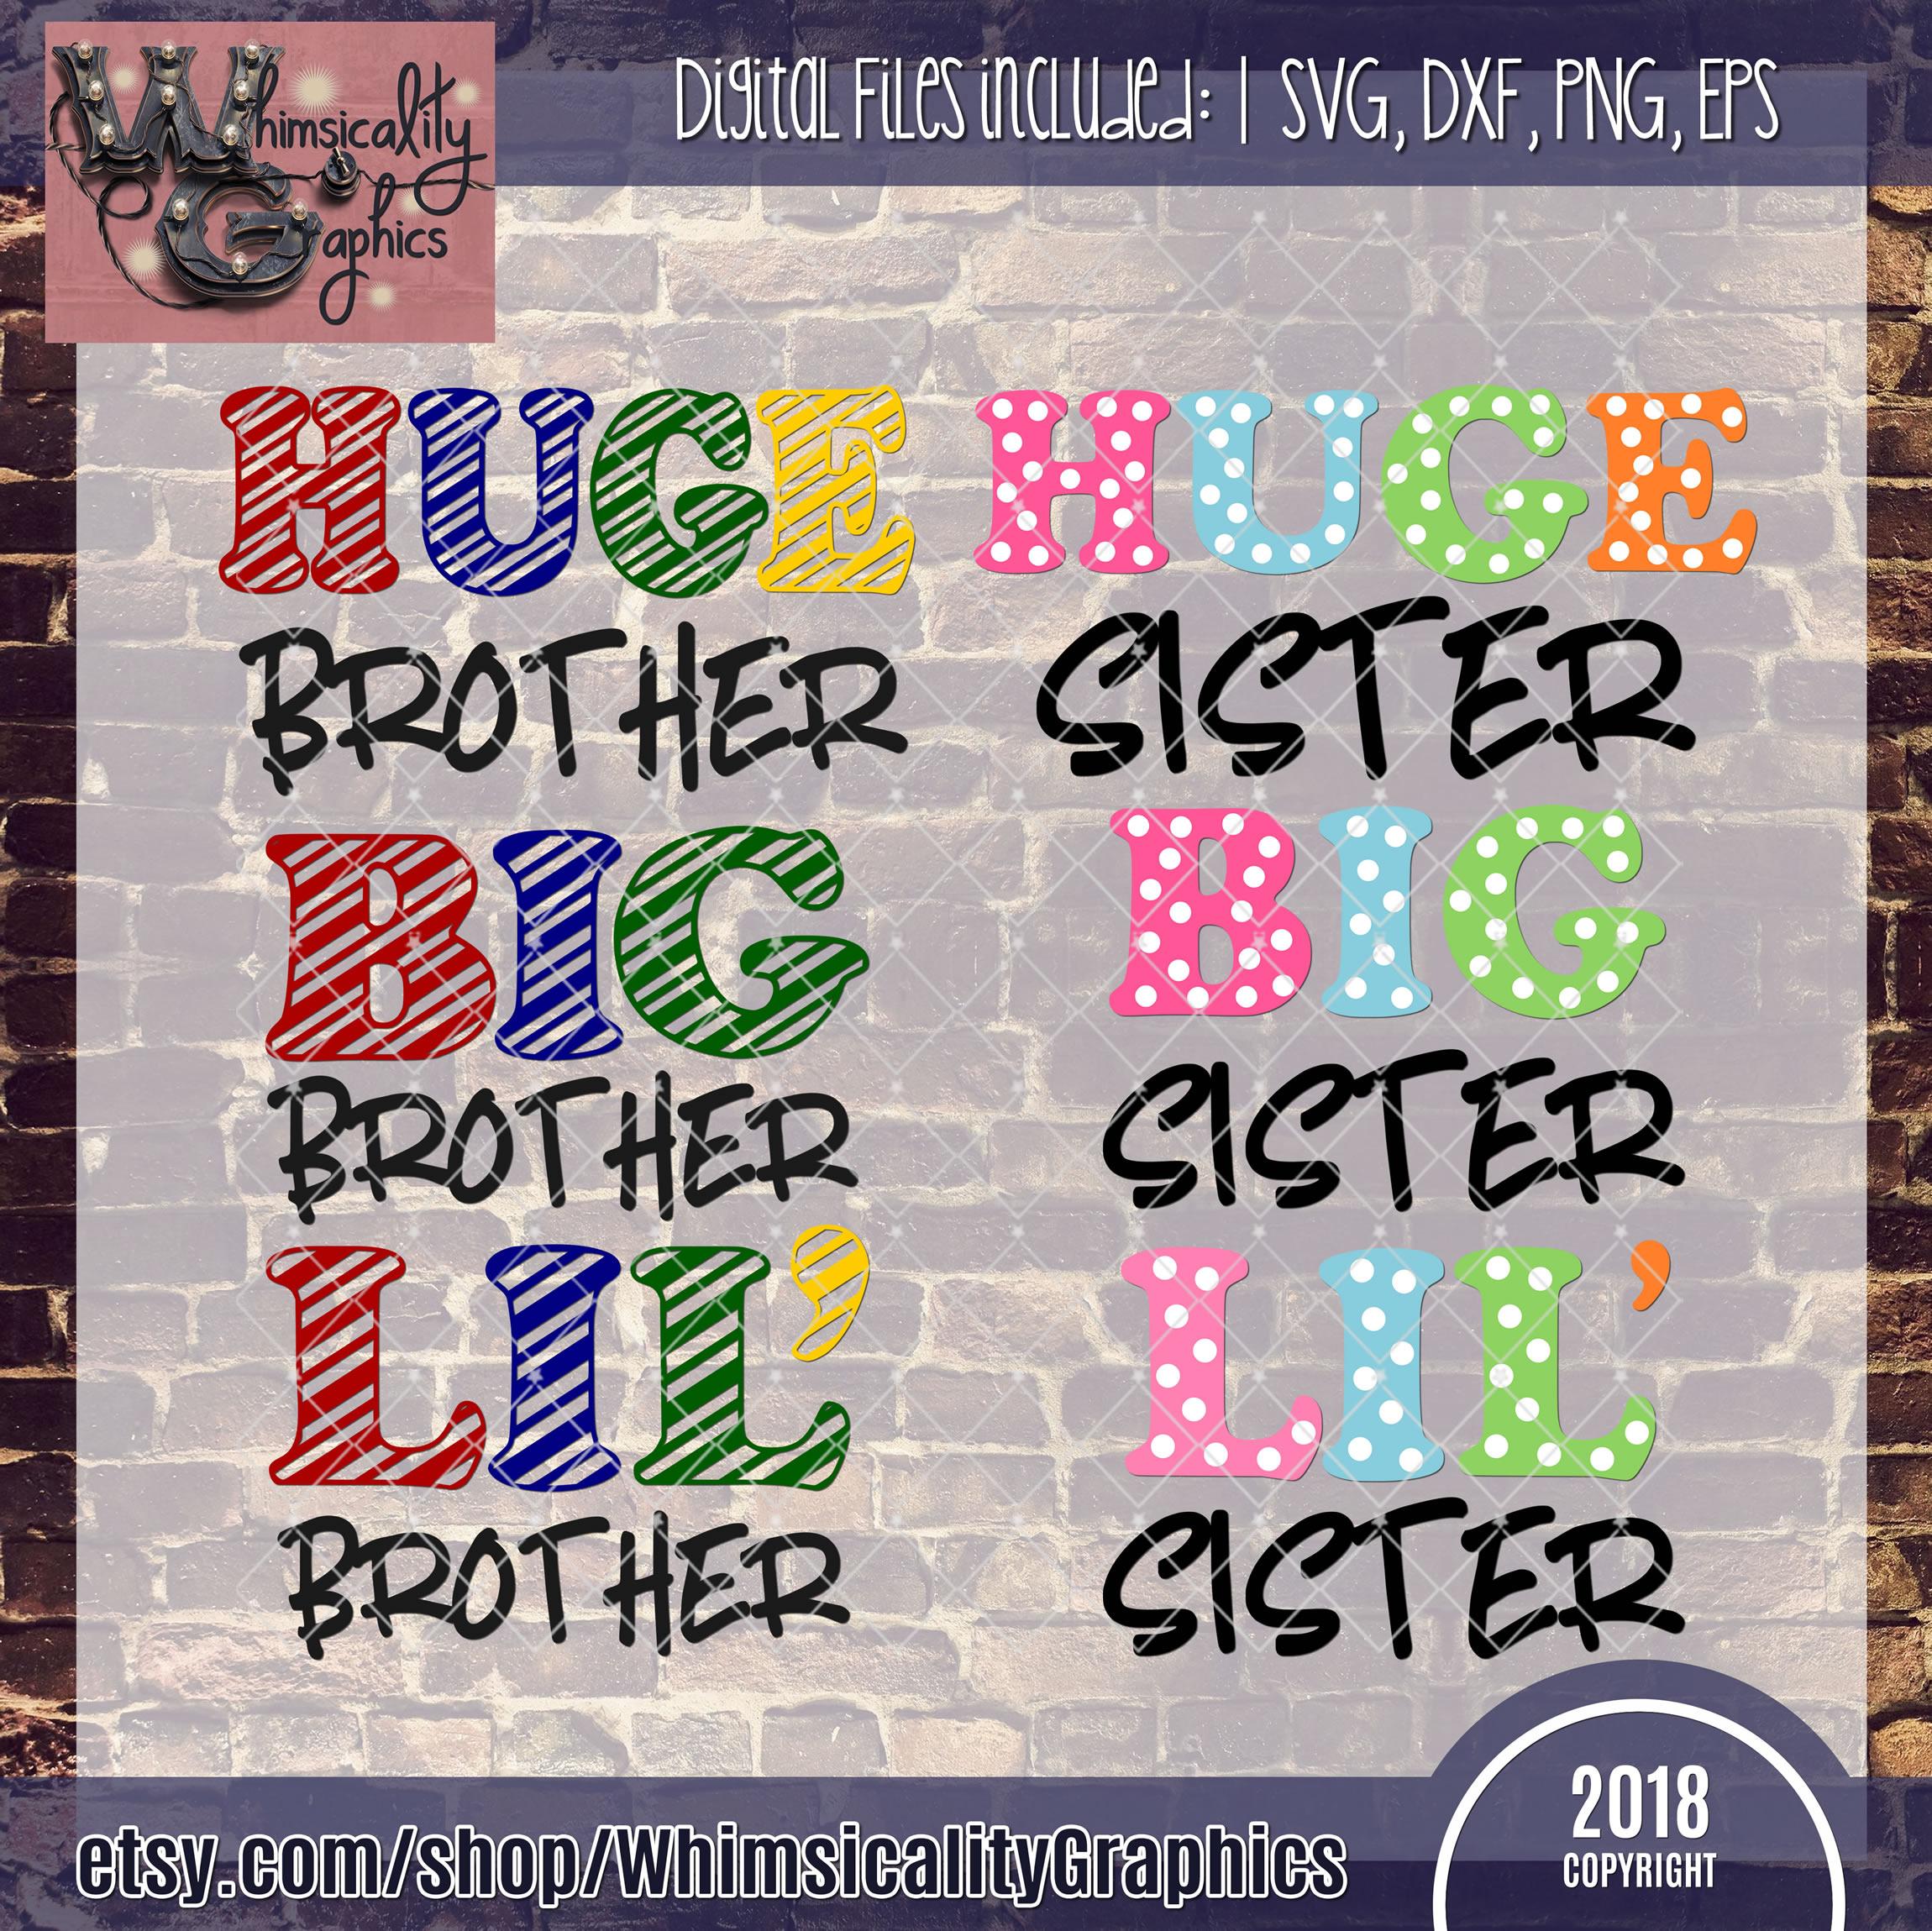 Sister Brother Huge Big Lil SVG DXF PNG EPS Comm example image 2